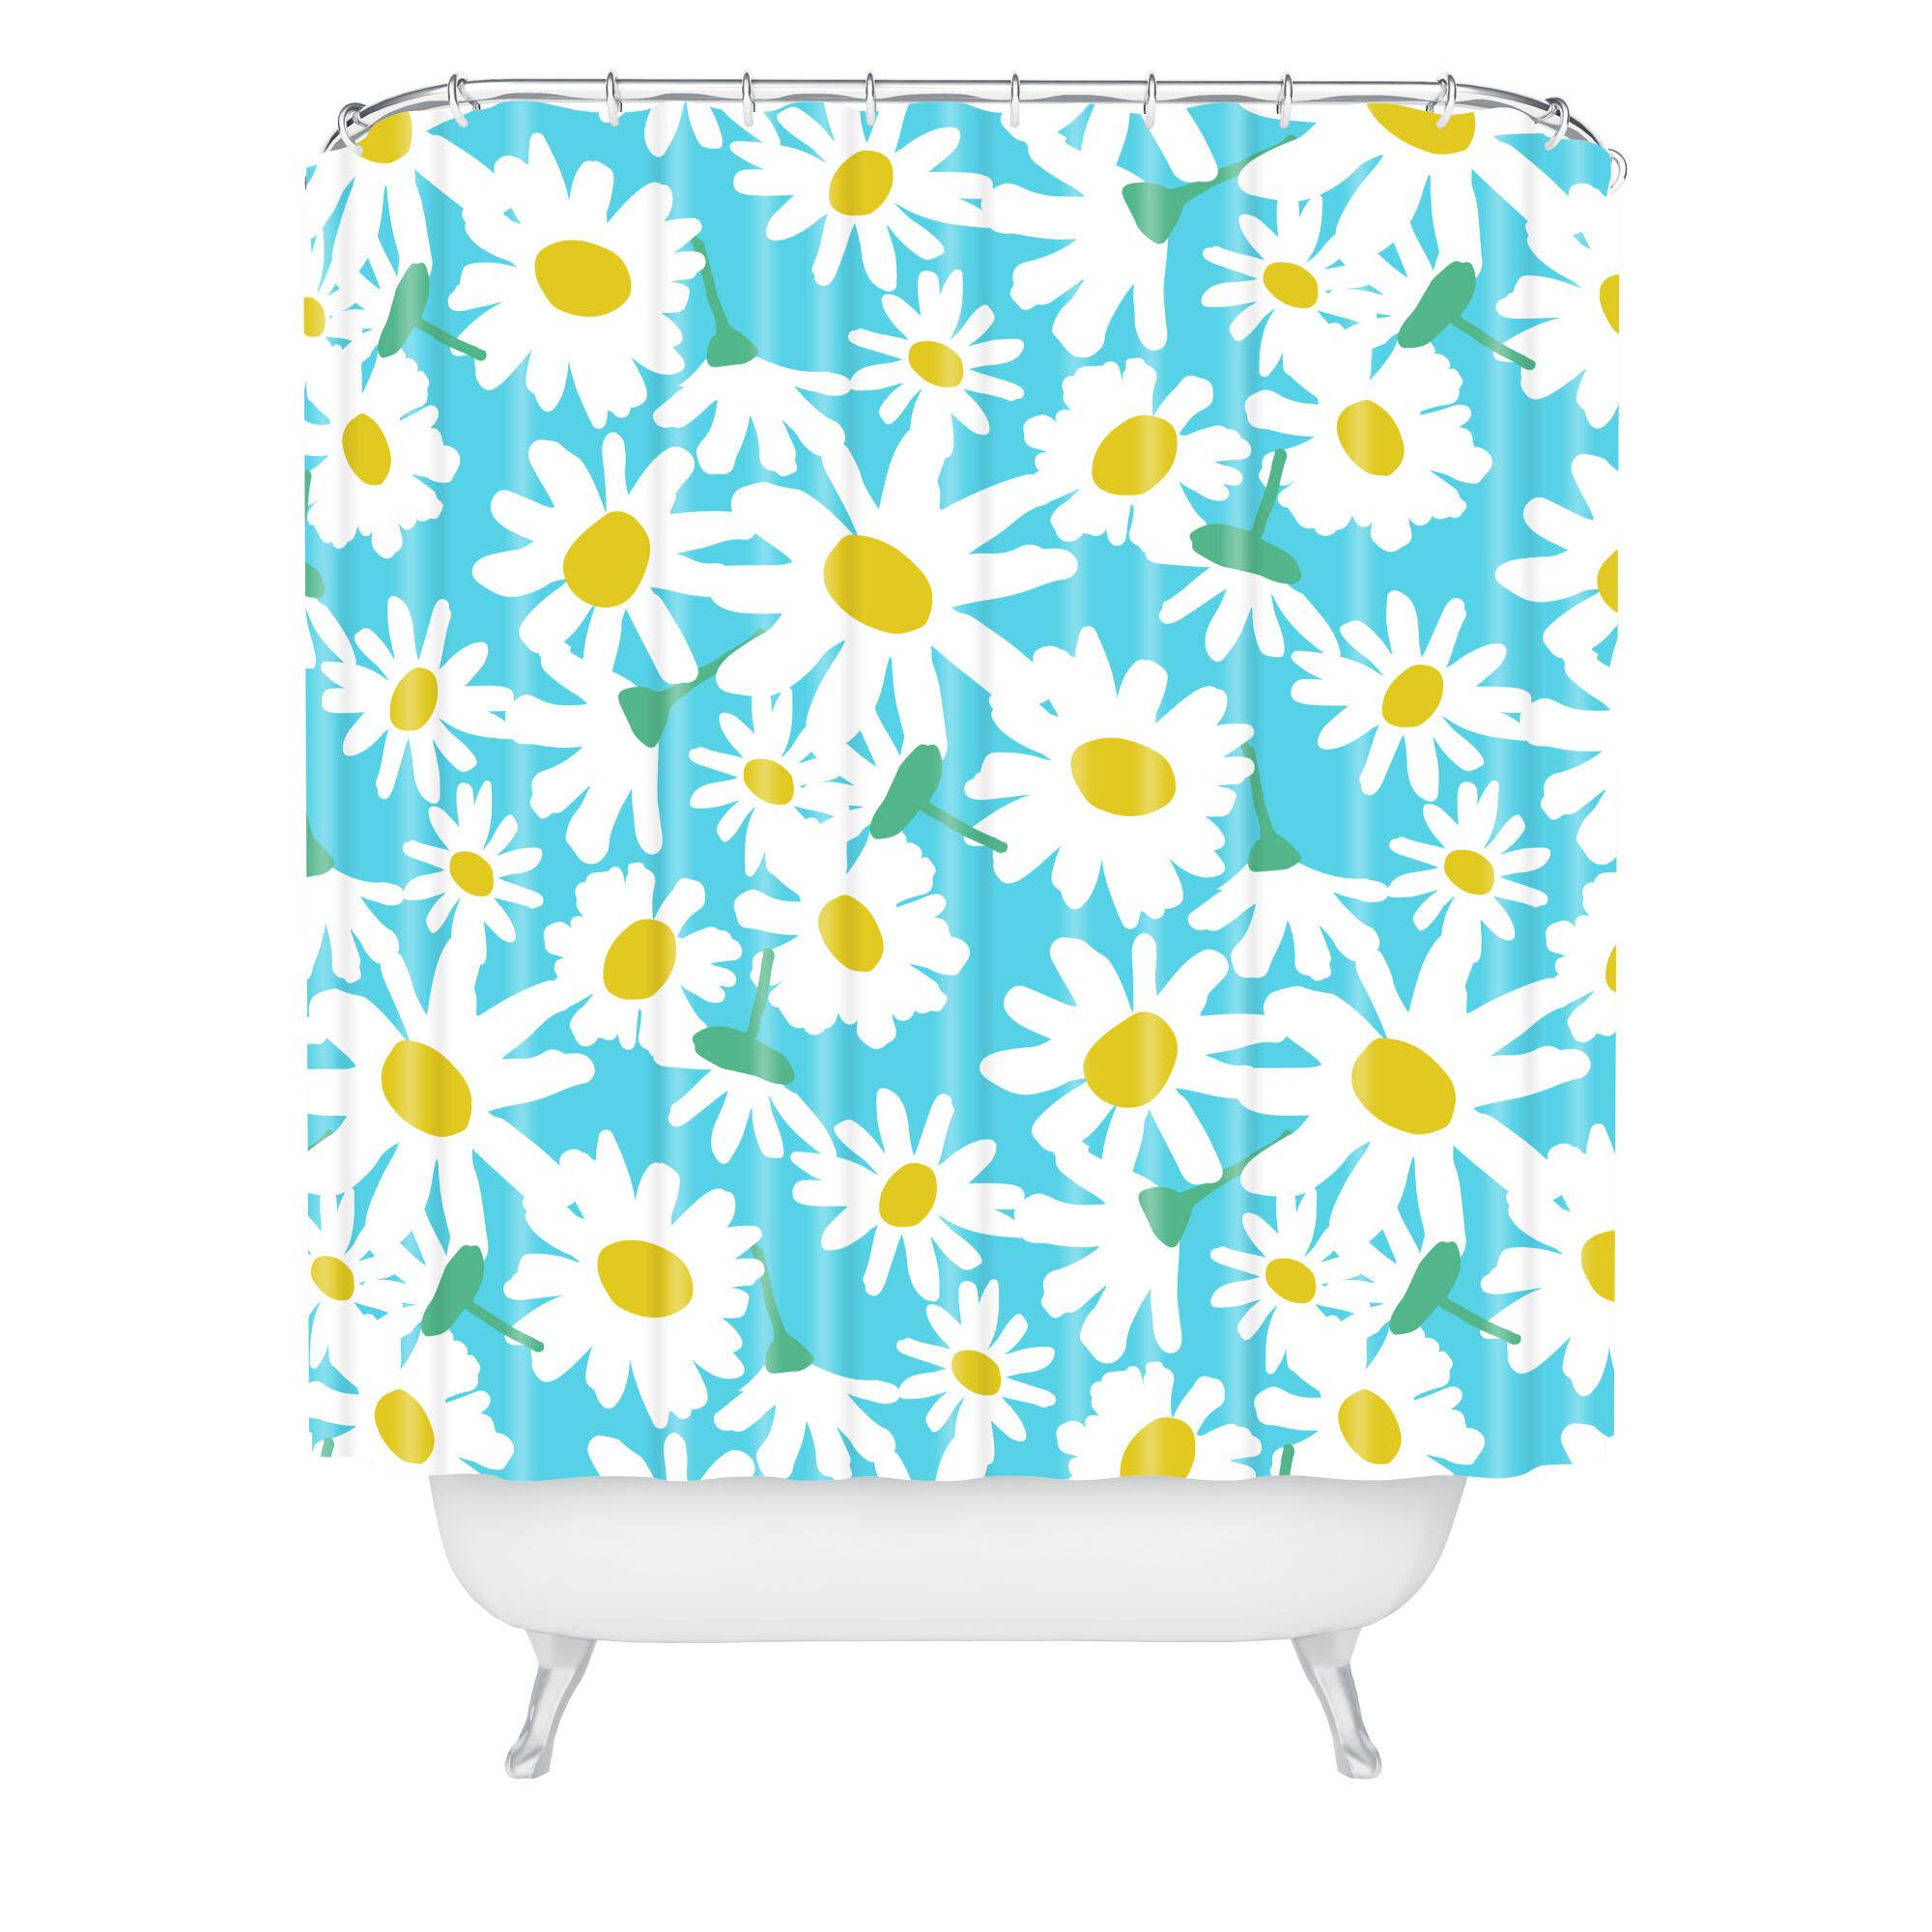 ... Designs Zoe Wodarz Daisy Do Right Shower Curtain